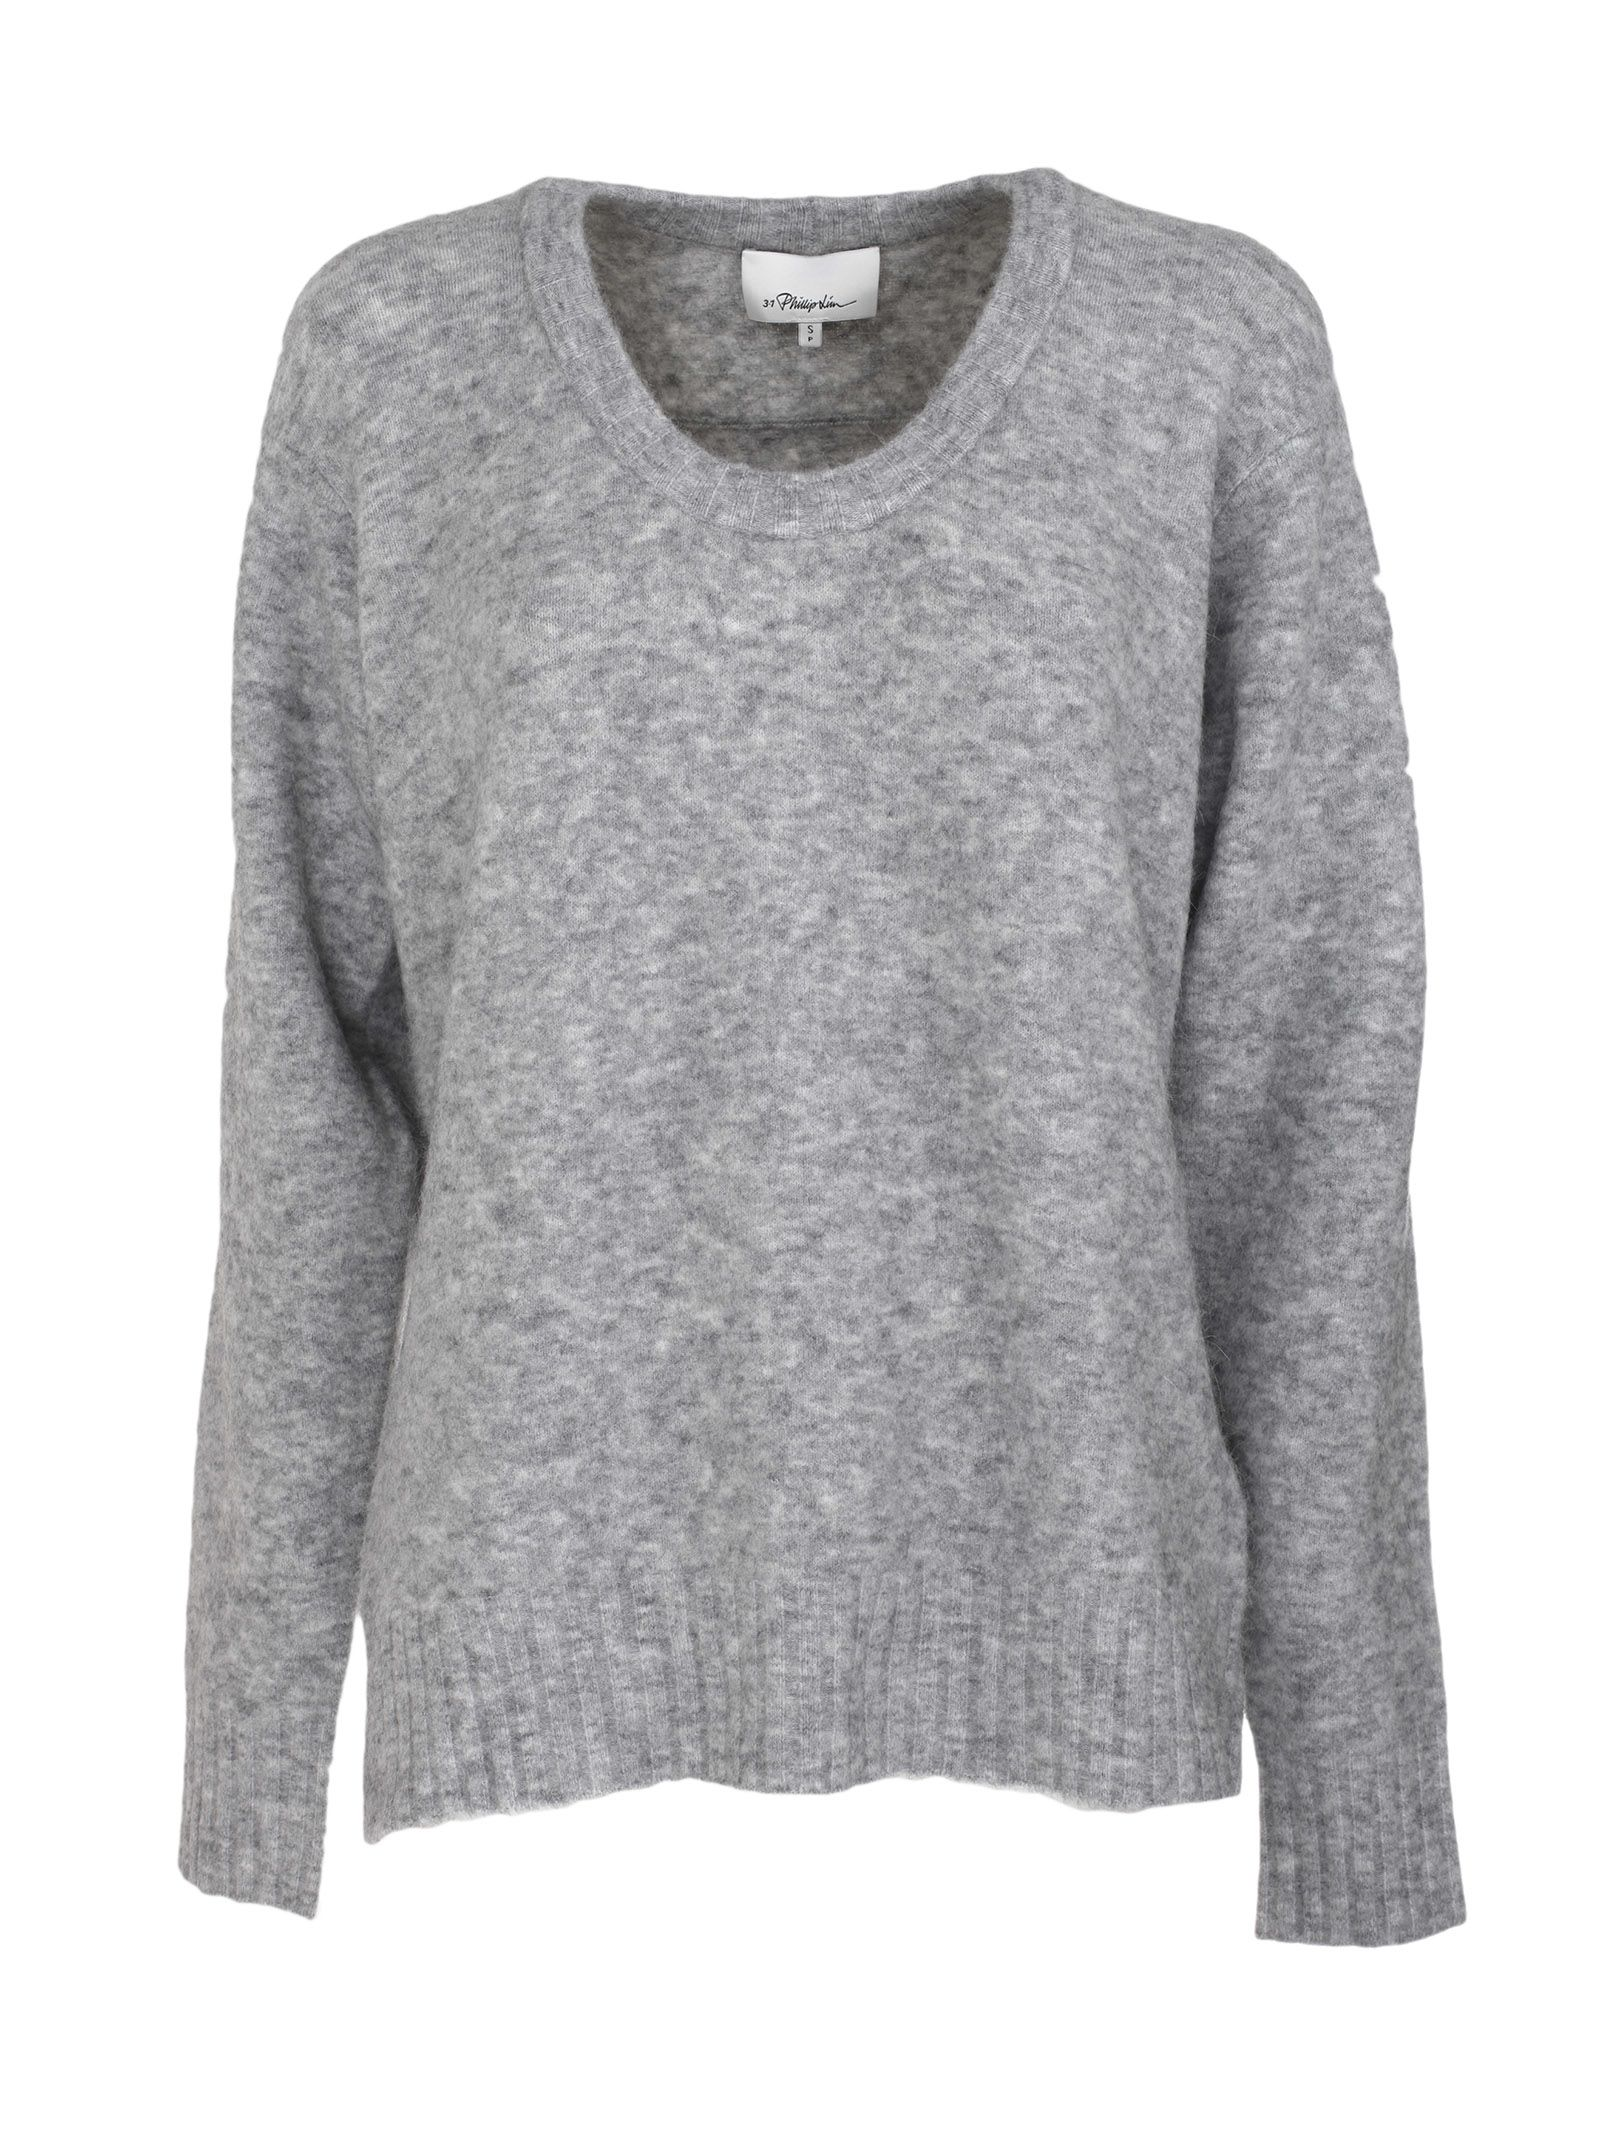 3.1 Phillip Lim Open Neck Sweater